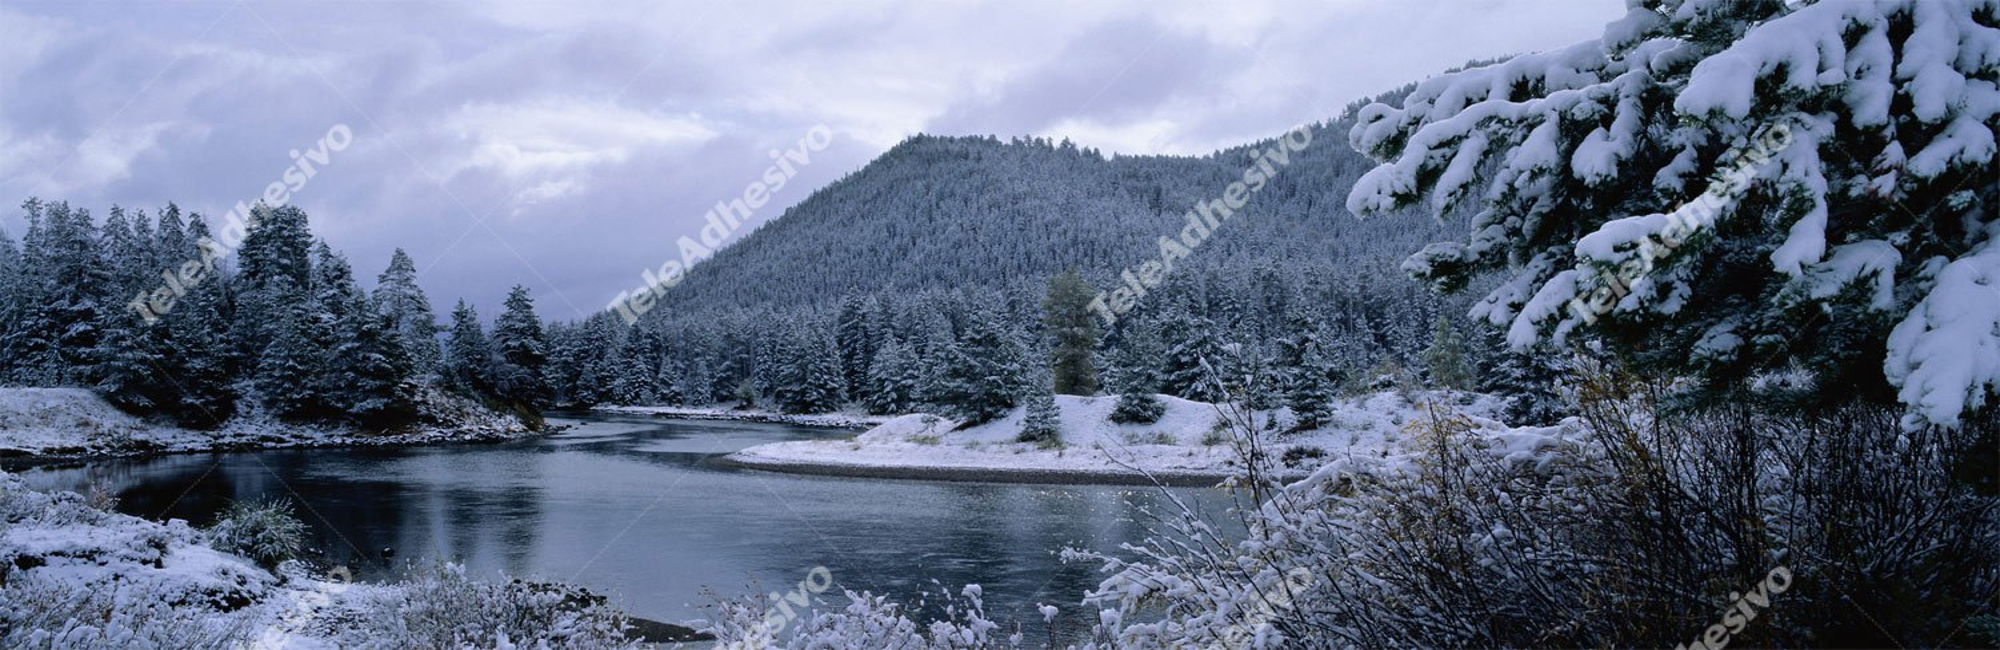 Fototapeten: Winter-Landschaft